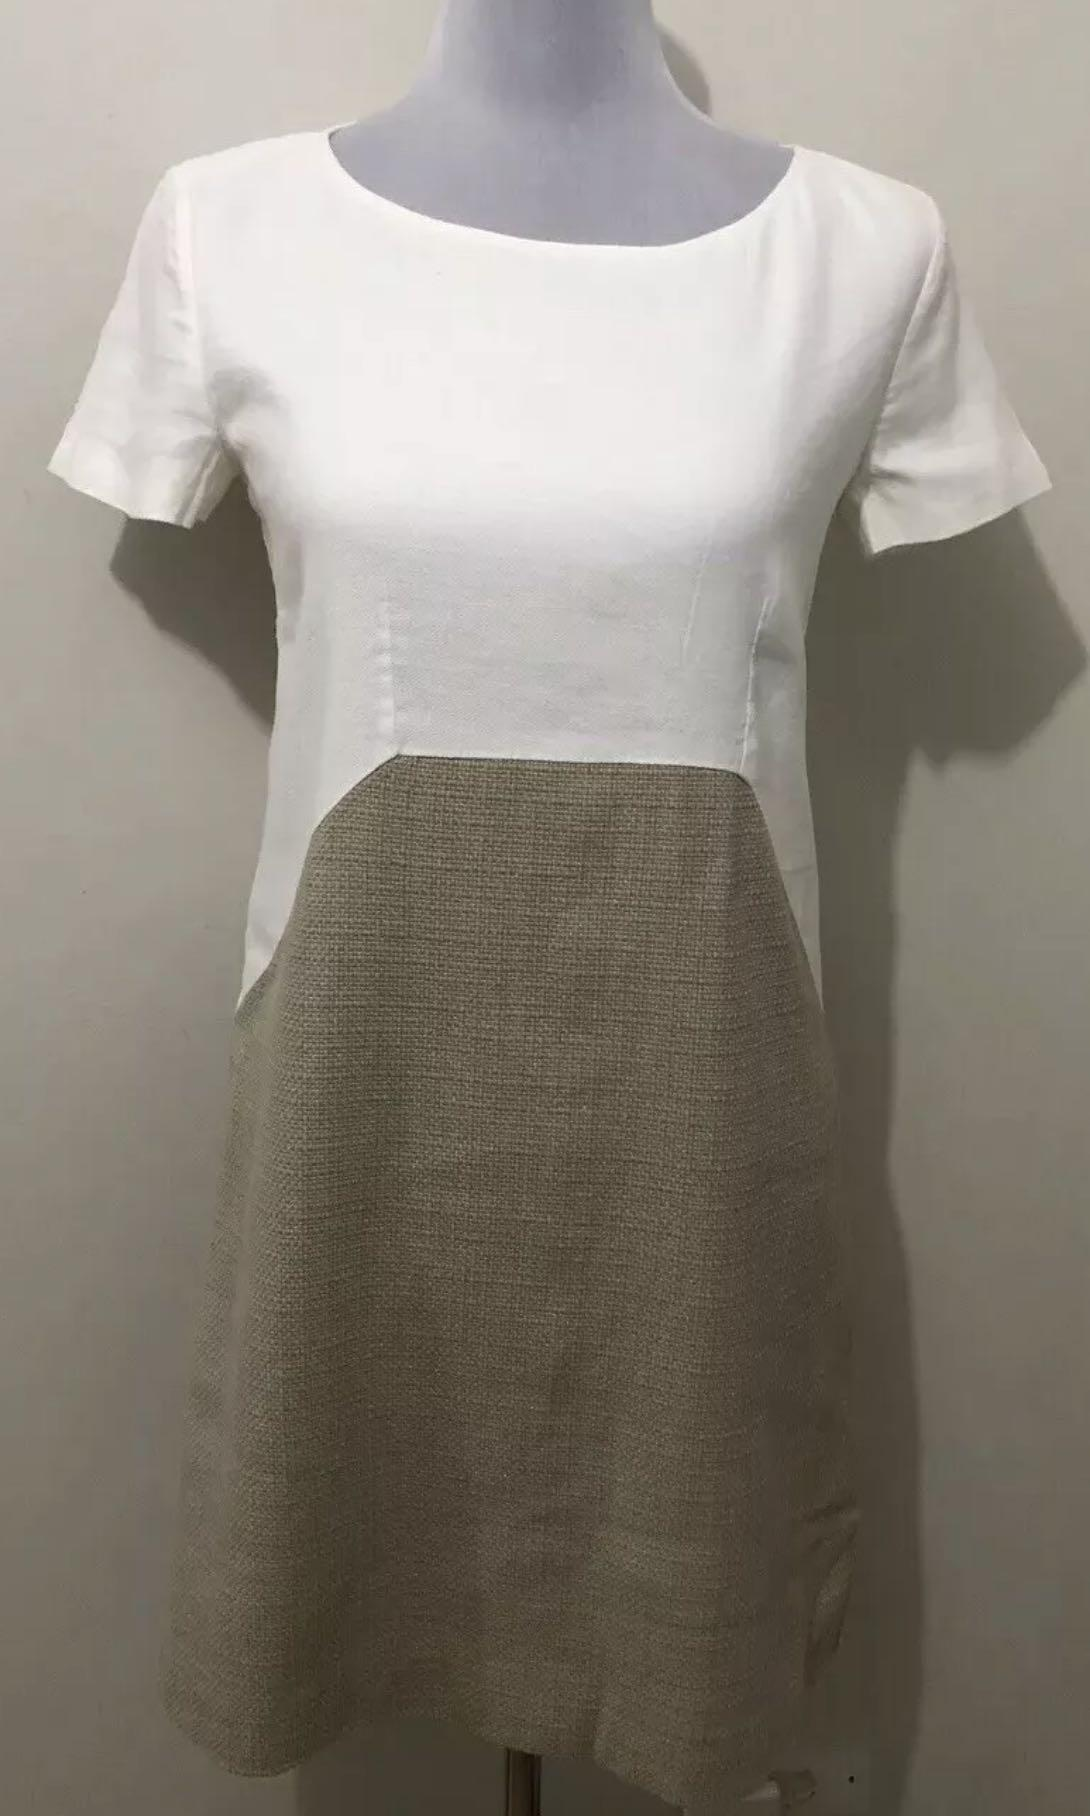 Ladies MAX & CO Ivory/Beige Woven Linen Blend Shift Dress. Size 8 UK. $480